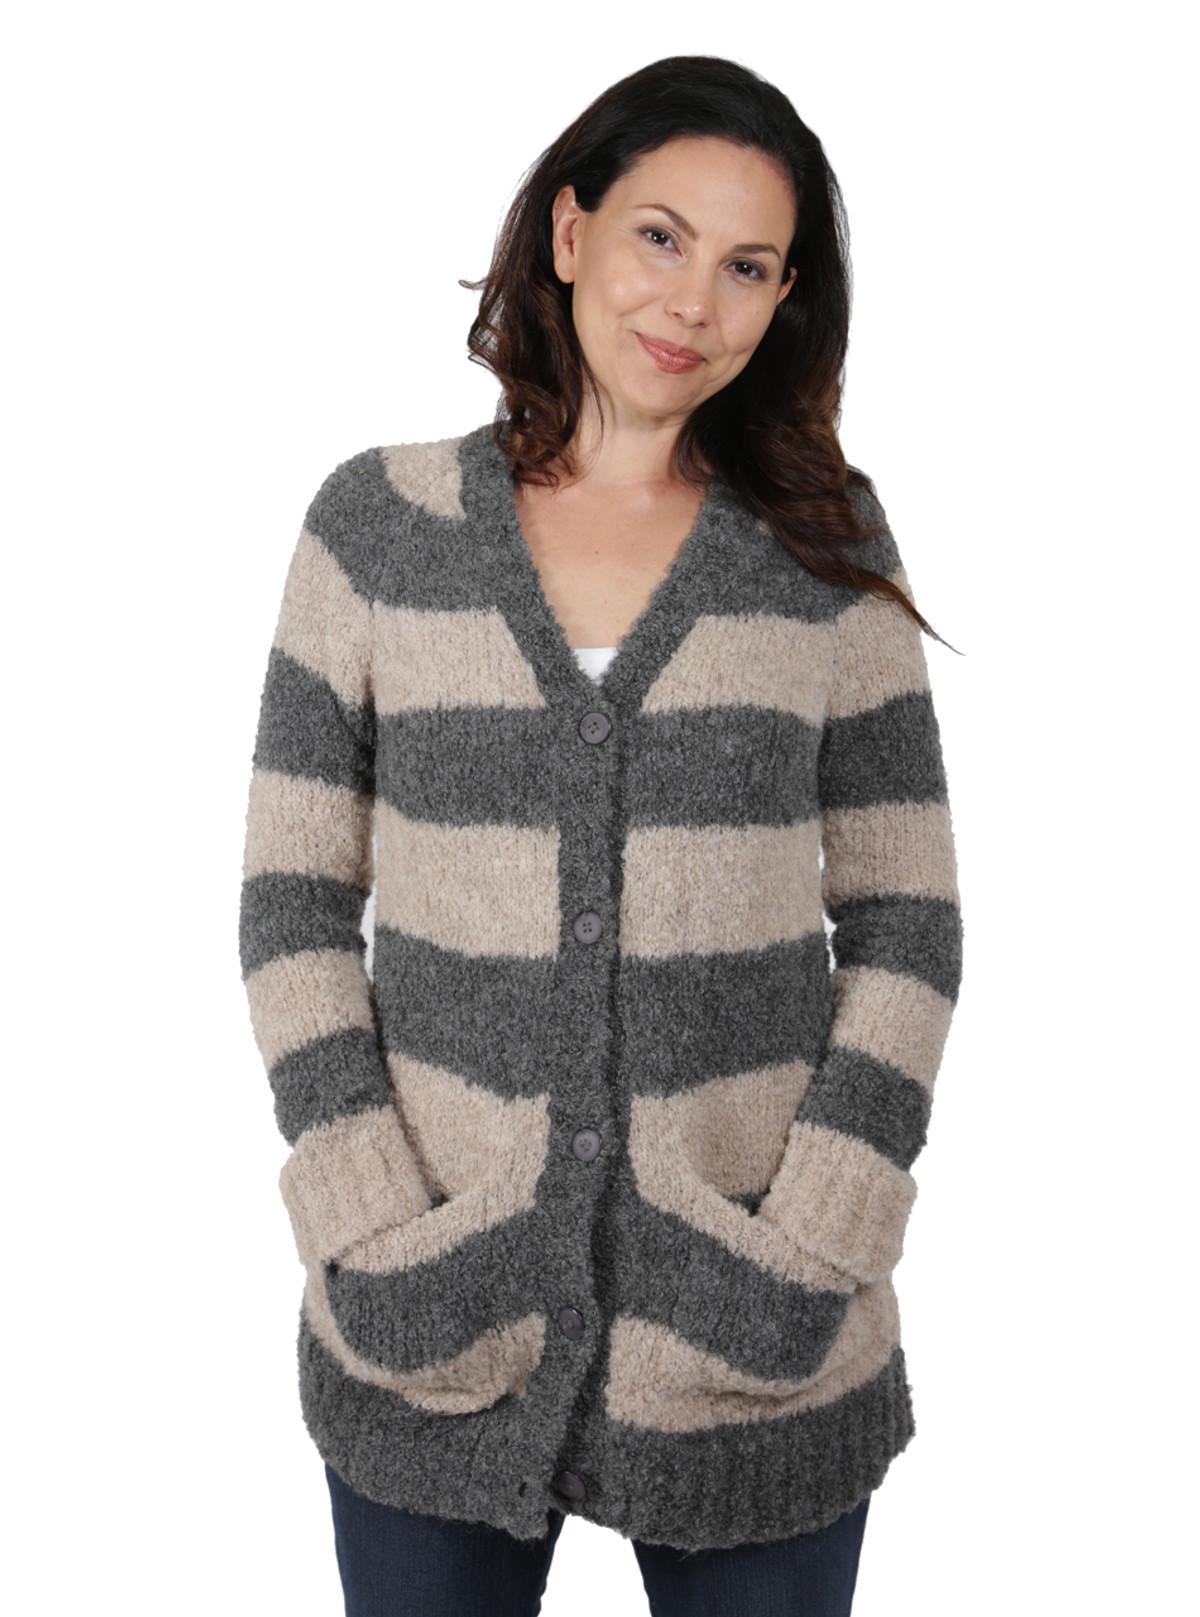 Women's Long Striped Cardigan in Baby Alpaca Boucle Yarn - Soft ...